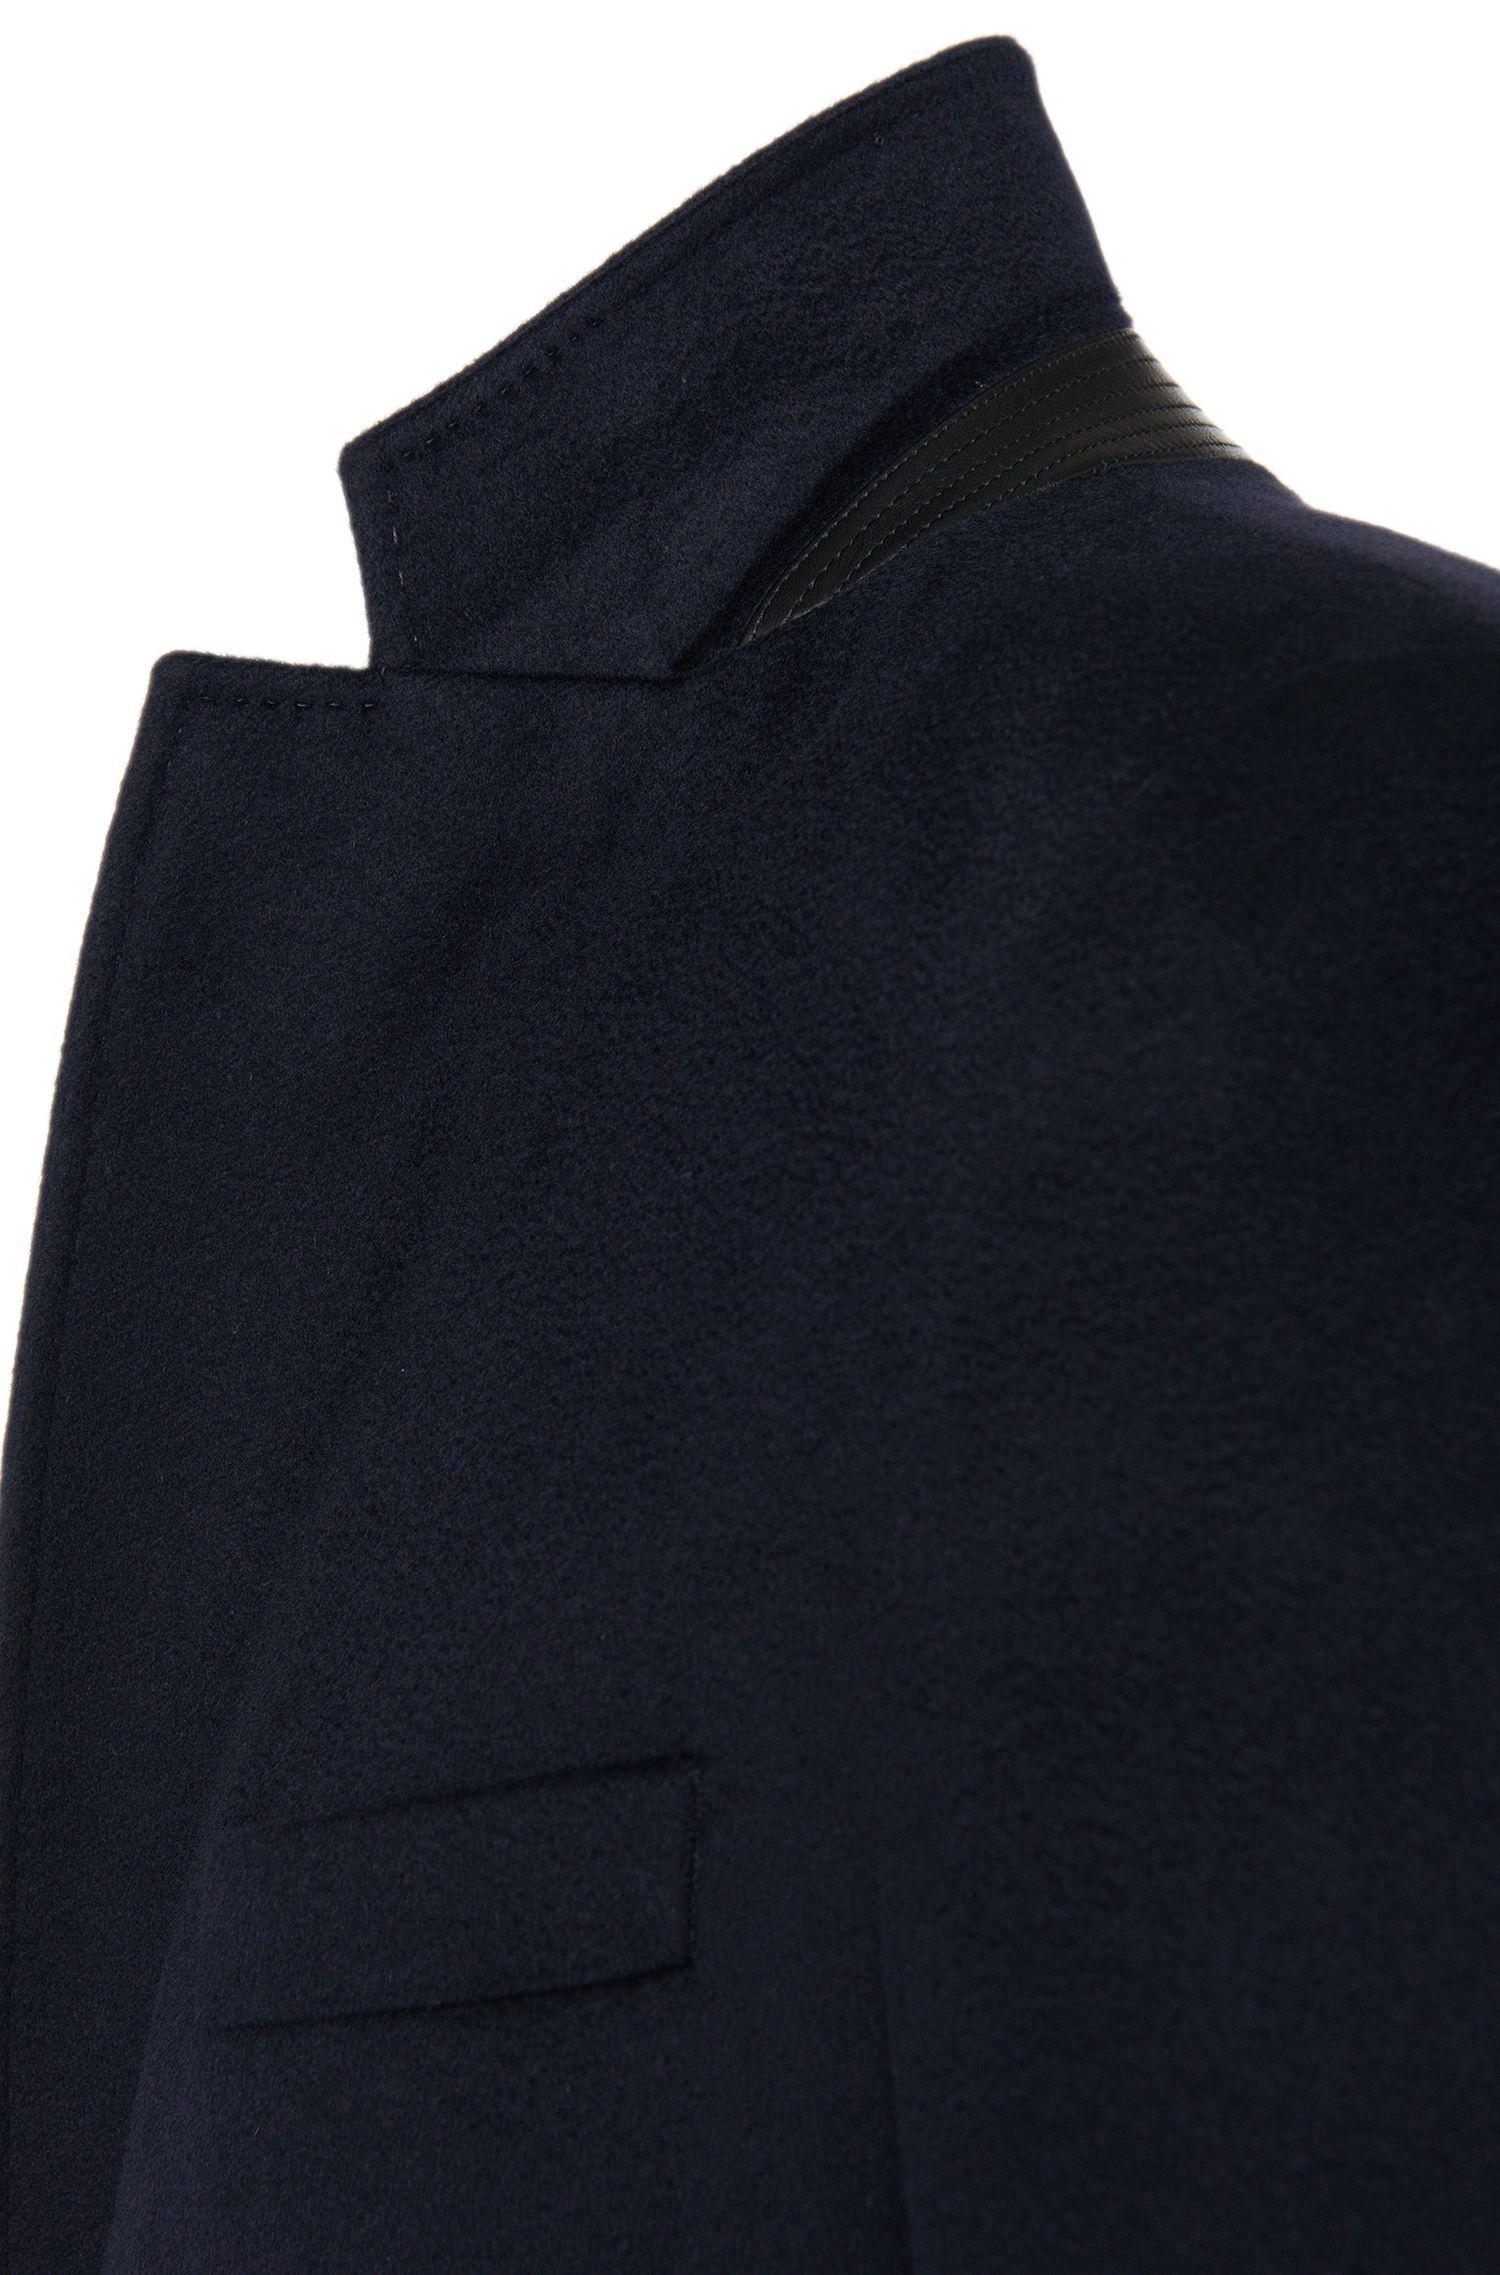 Tailored Mantel mit heraustrennbarer Jacke aus Schurwoll-Mix mit Kaschmir: 'T-Lennard2'